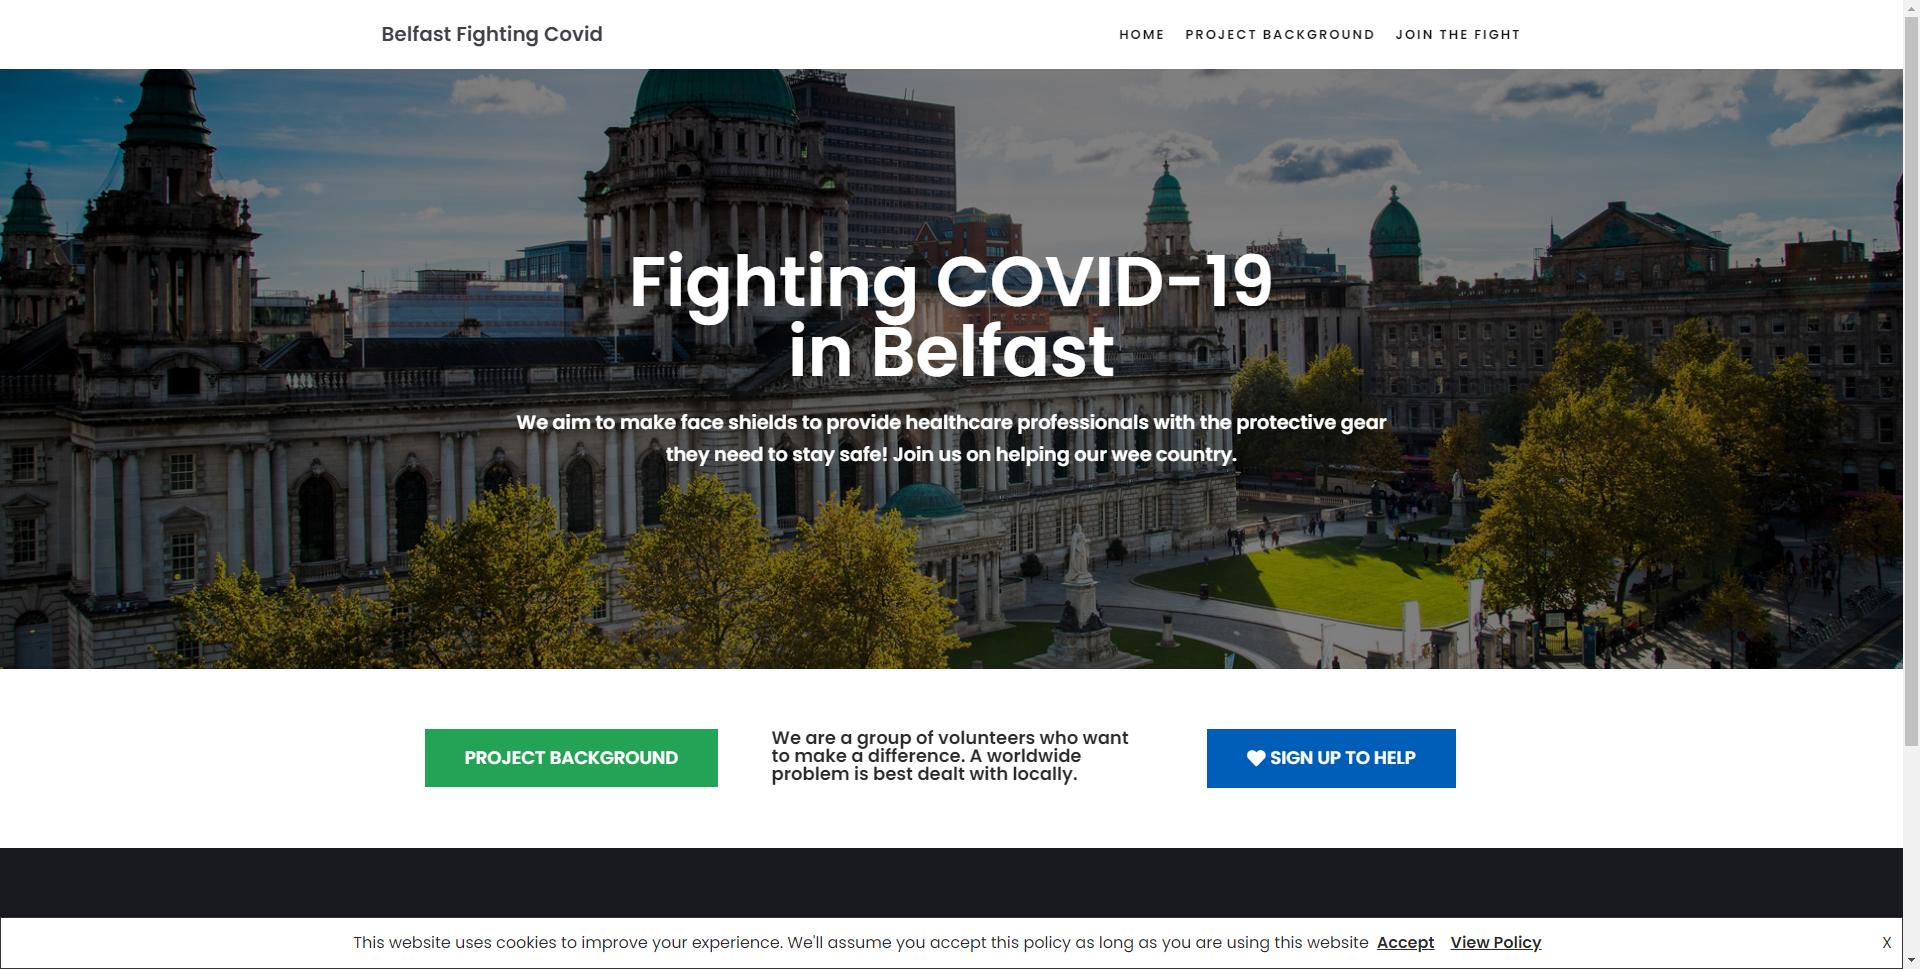 belfastfightingcovid.com Websites